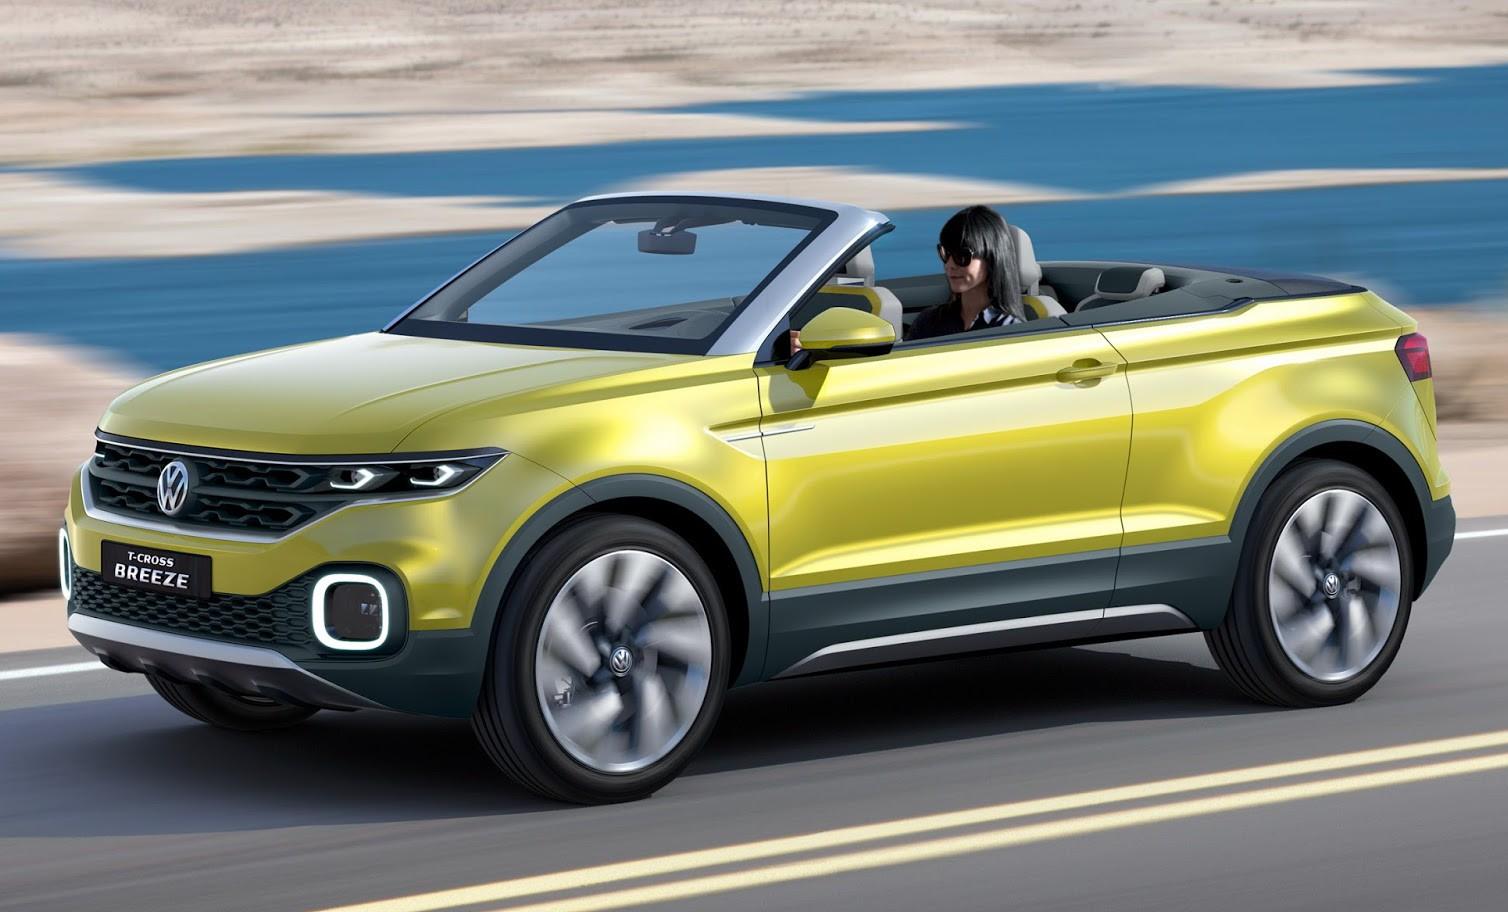 VW-T-Cross-Breeze-Concept-1